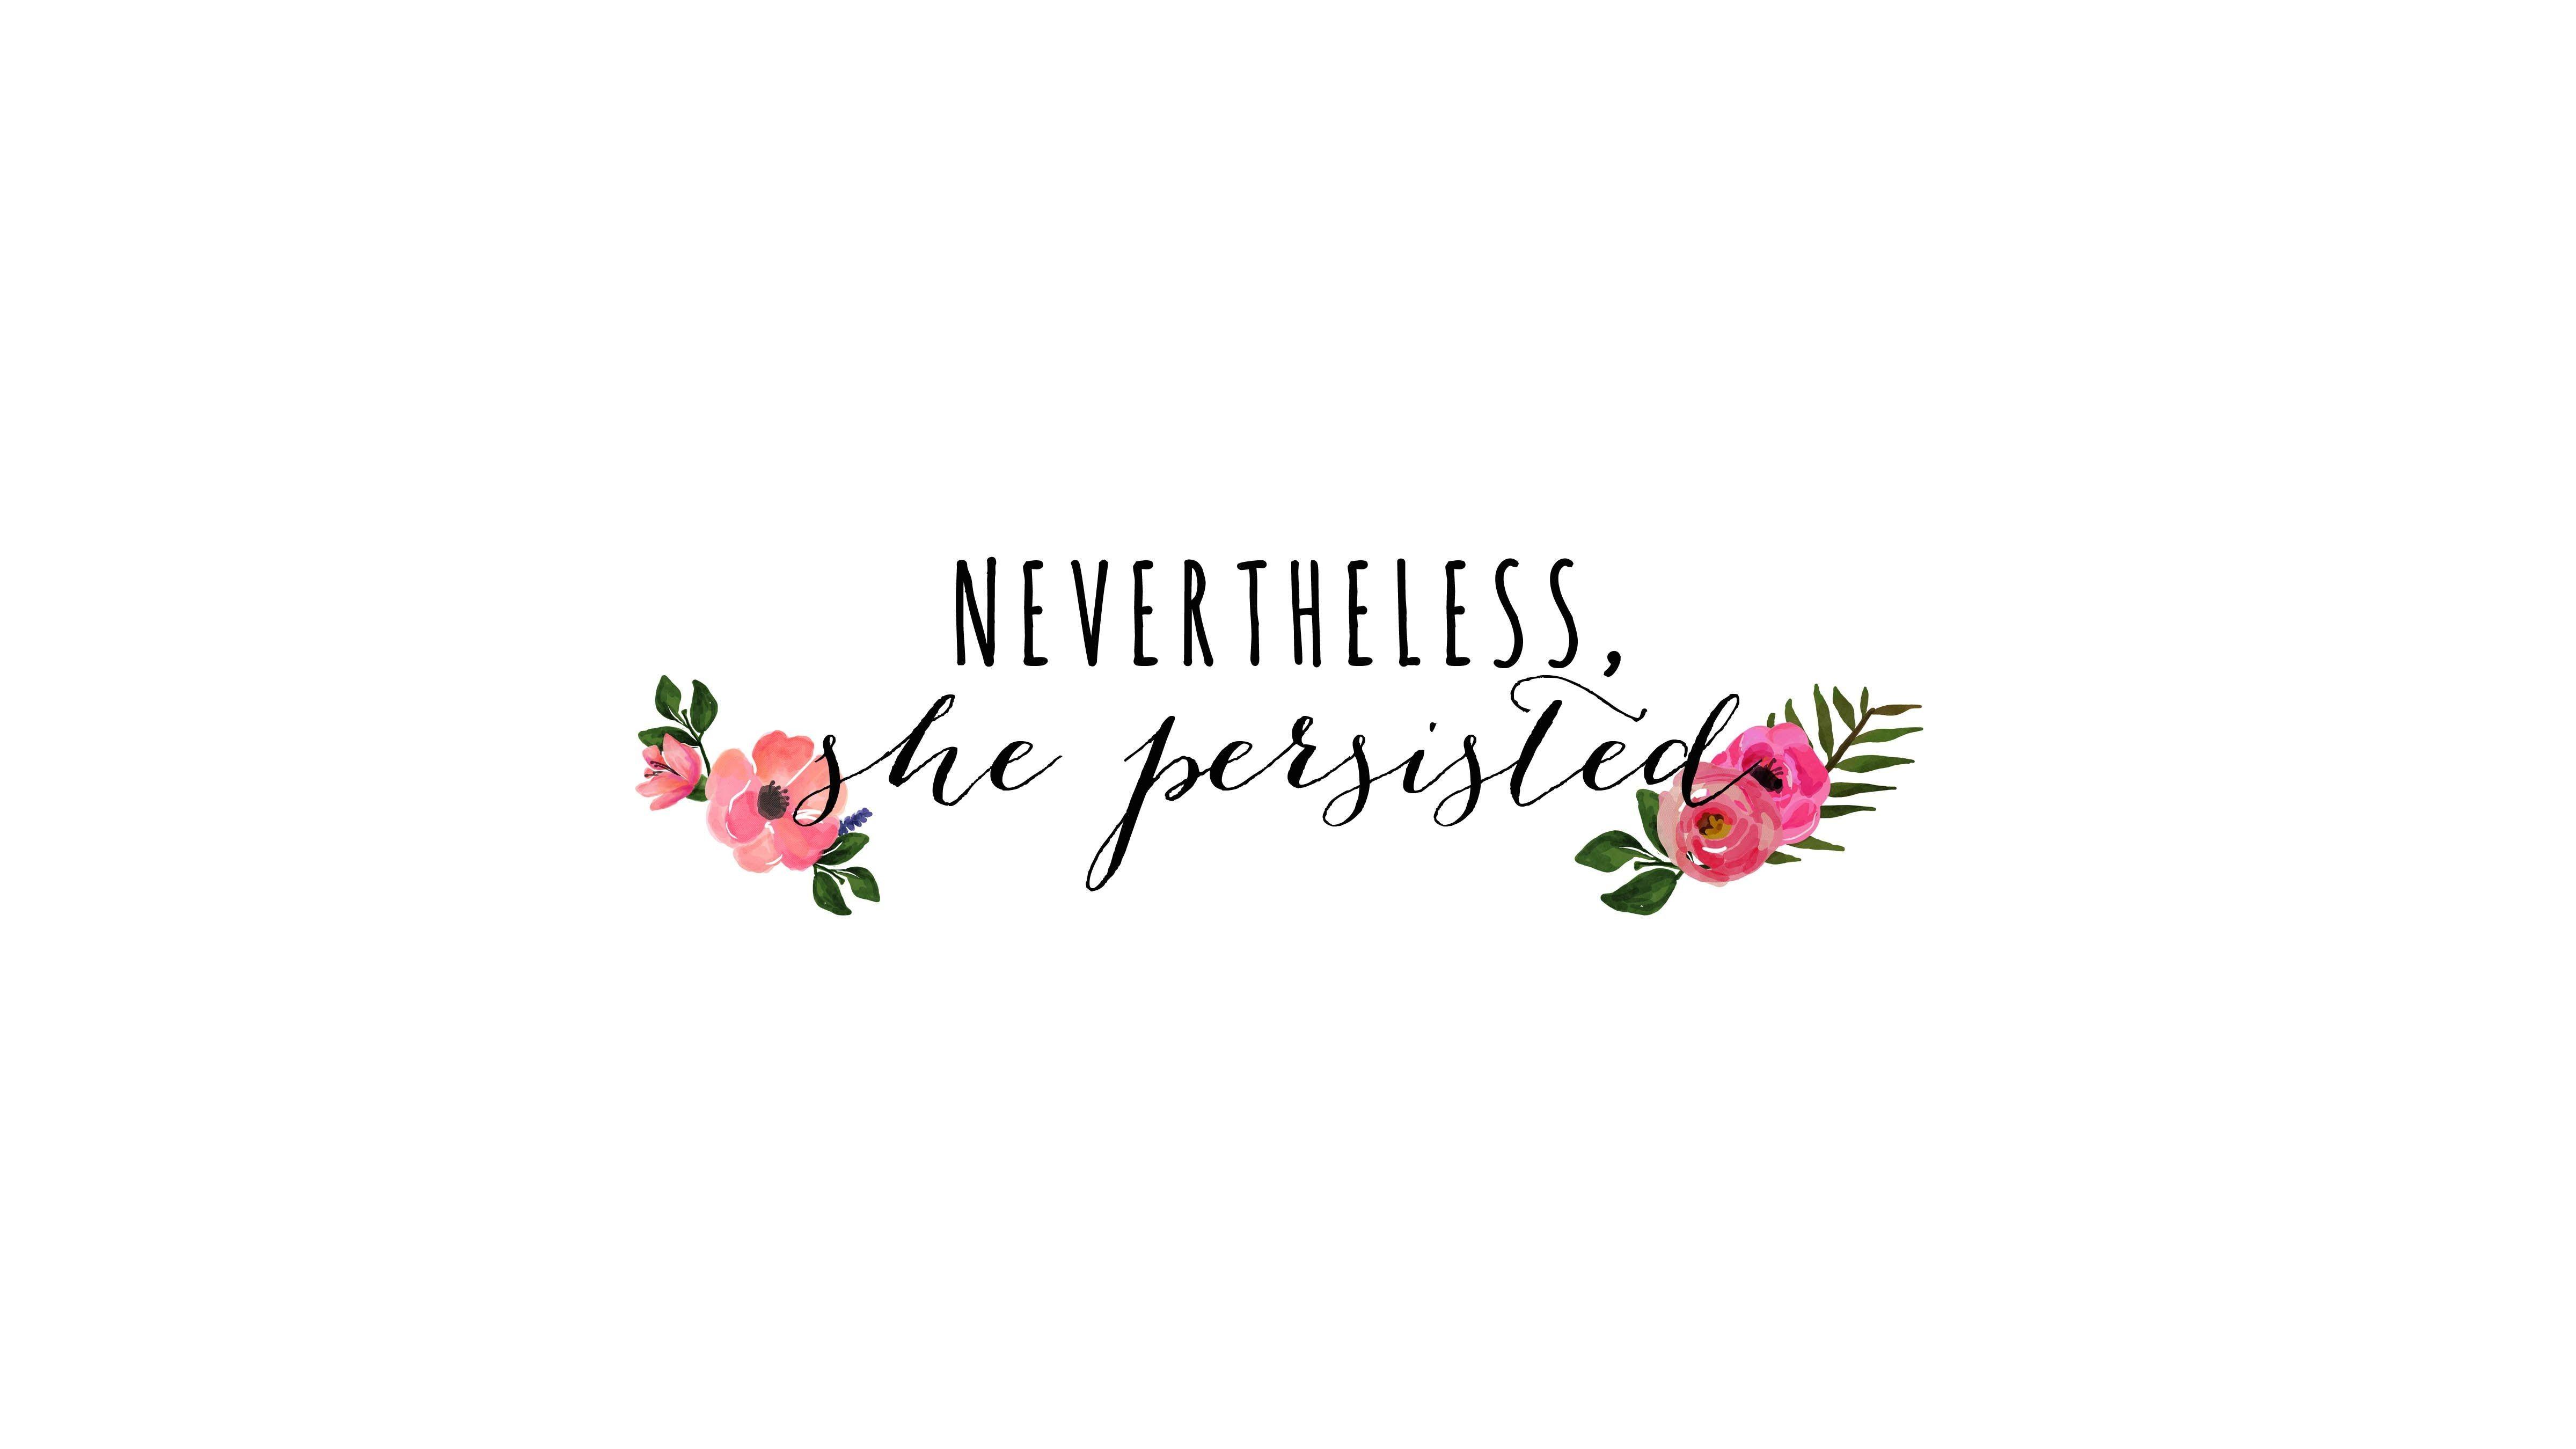 Motivational Wallpaper For Laptop Tumblr Quotes Love Wallpaper